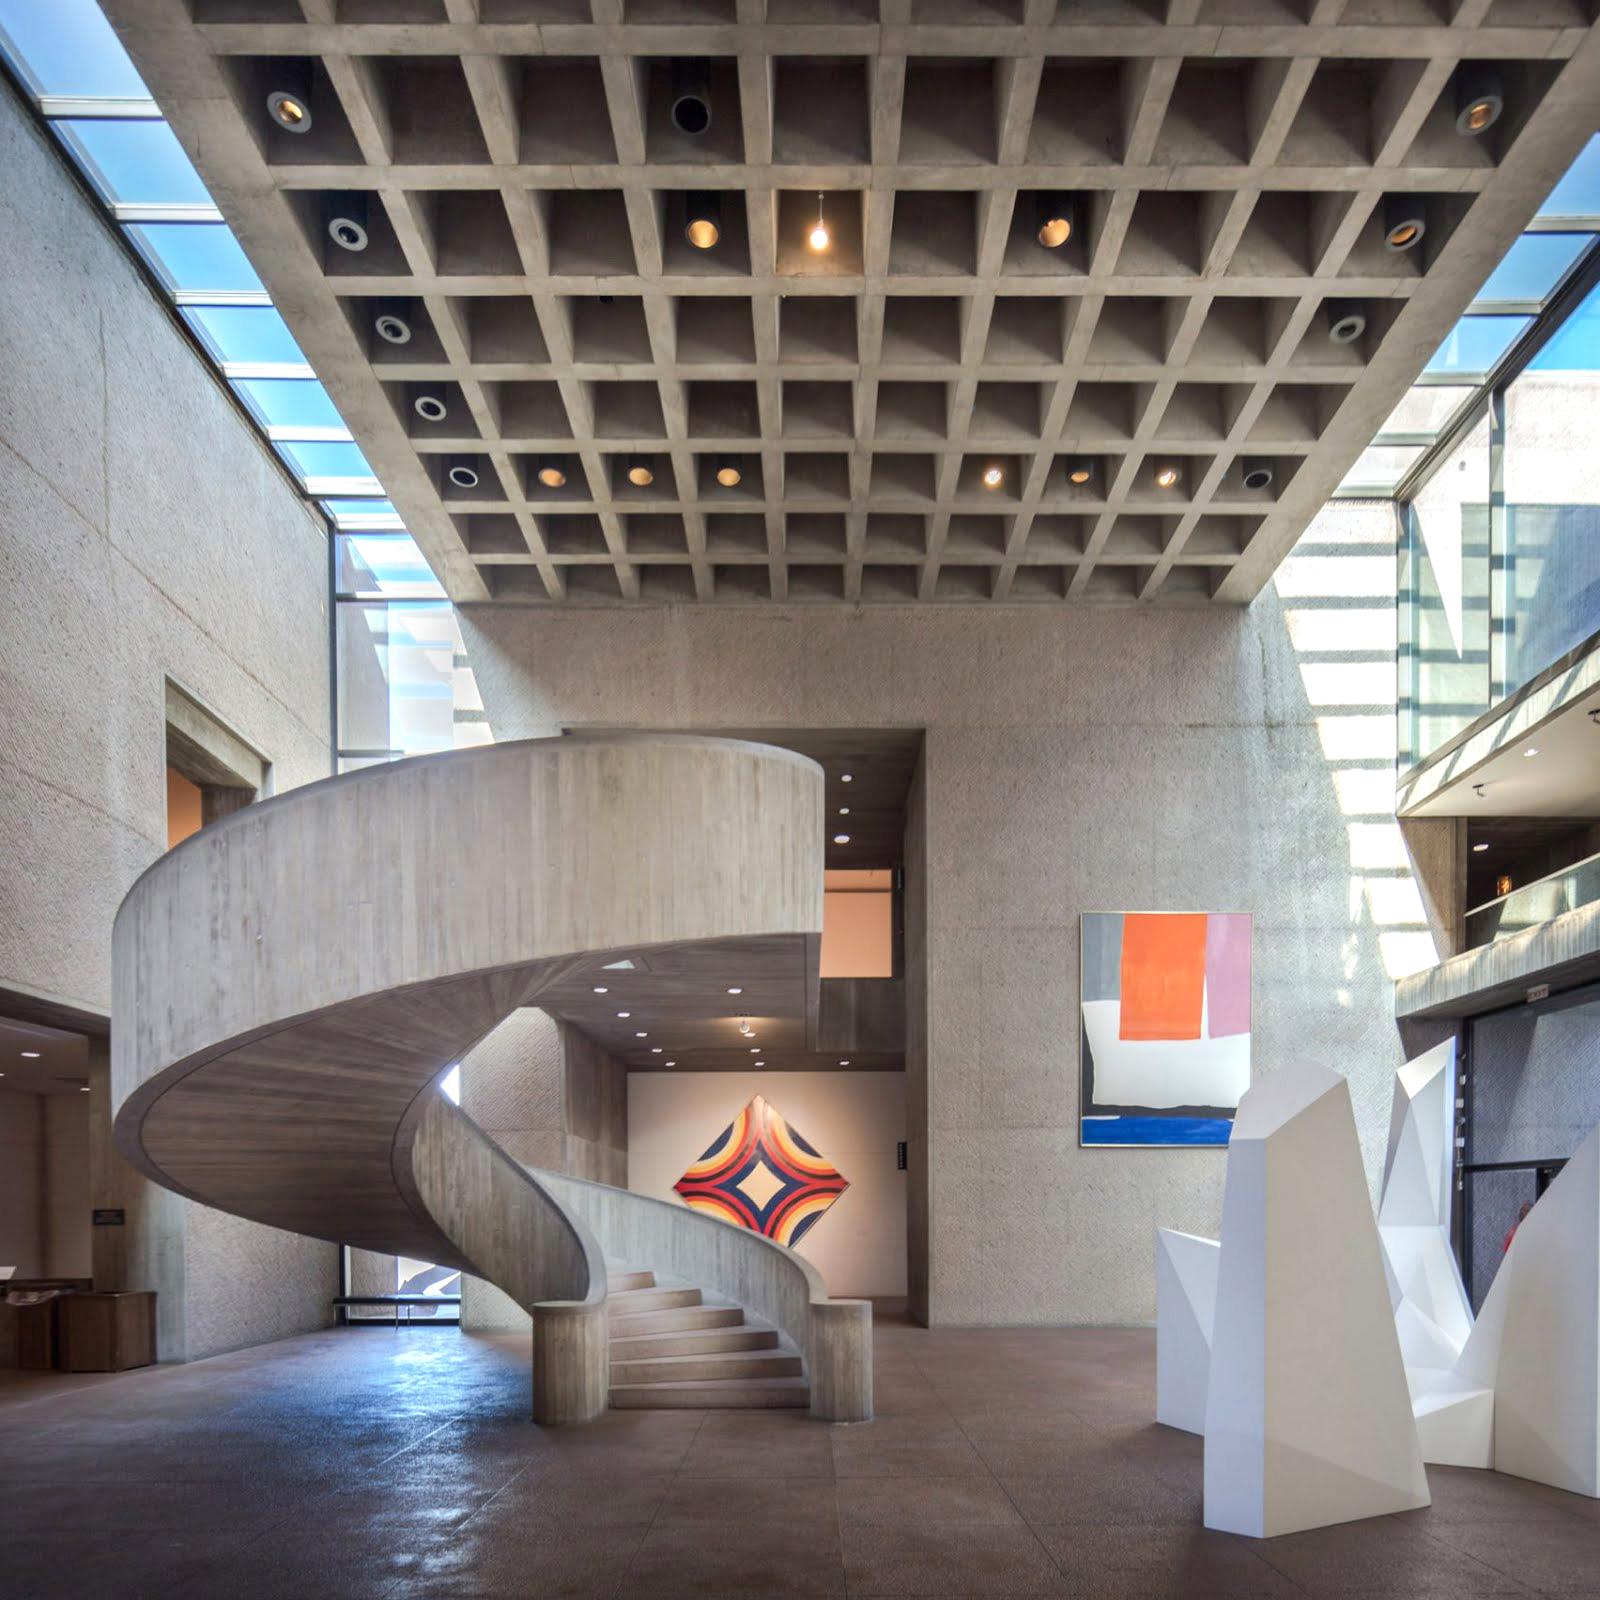 15-architectural-marvels-and-surprises-along-the-east-coast-usa-sam-lubell-darren-bradley-i-m-pei_dezeen_2364_sq-1704x1704-752578.jpg